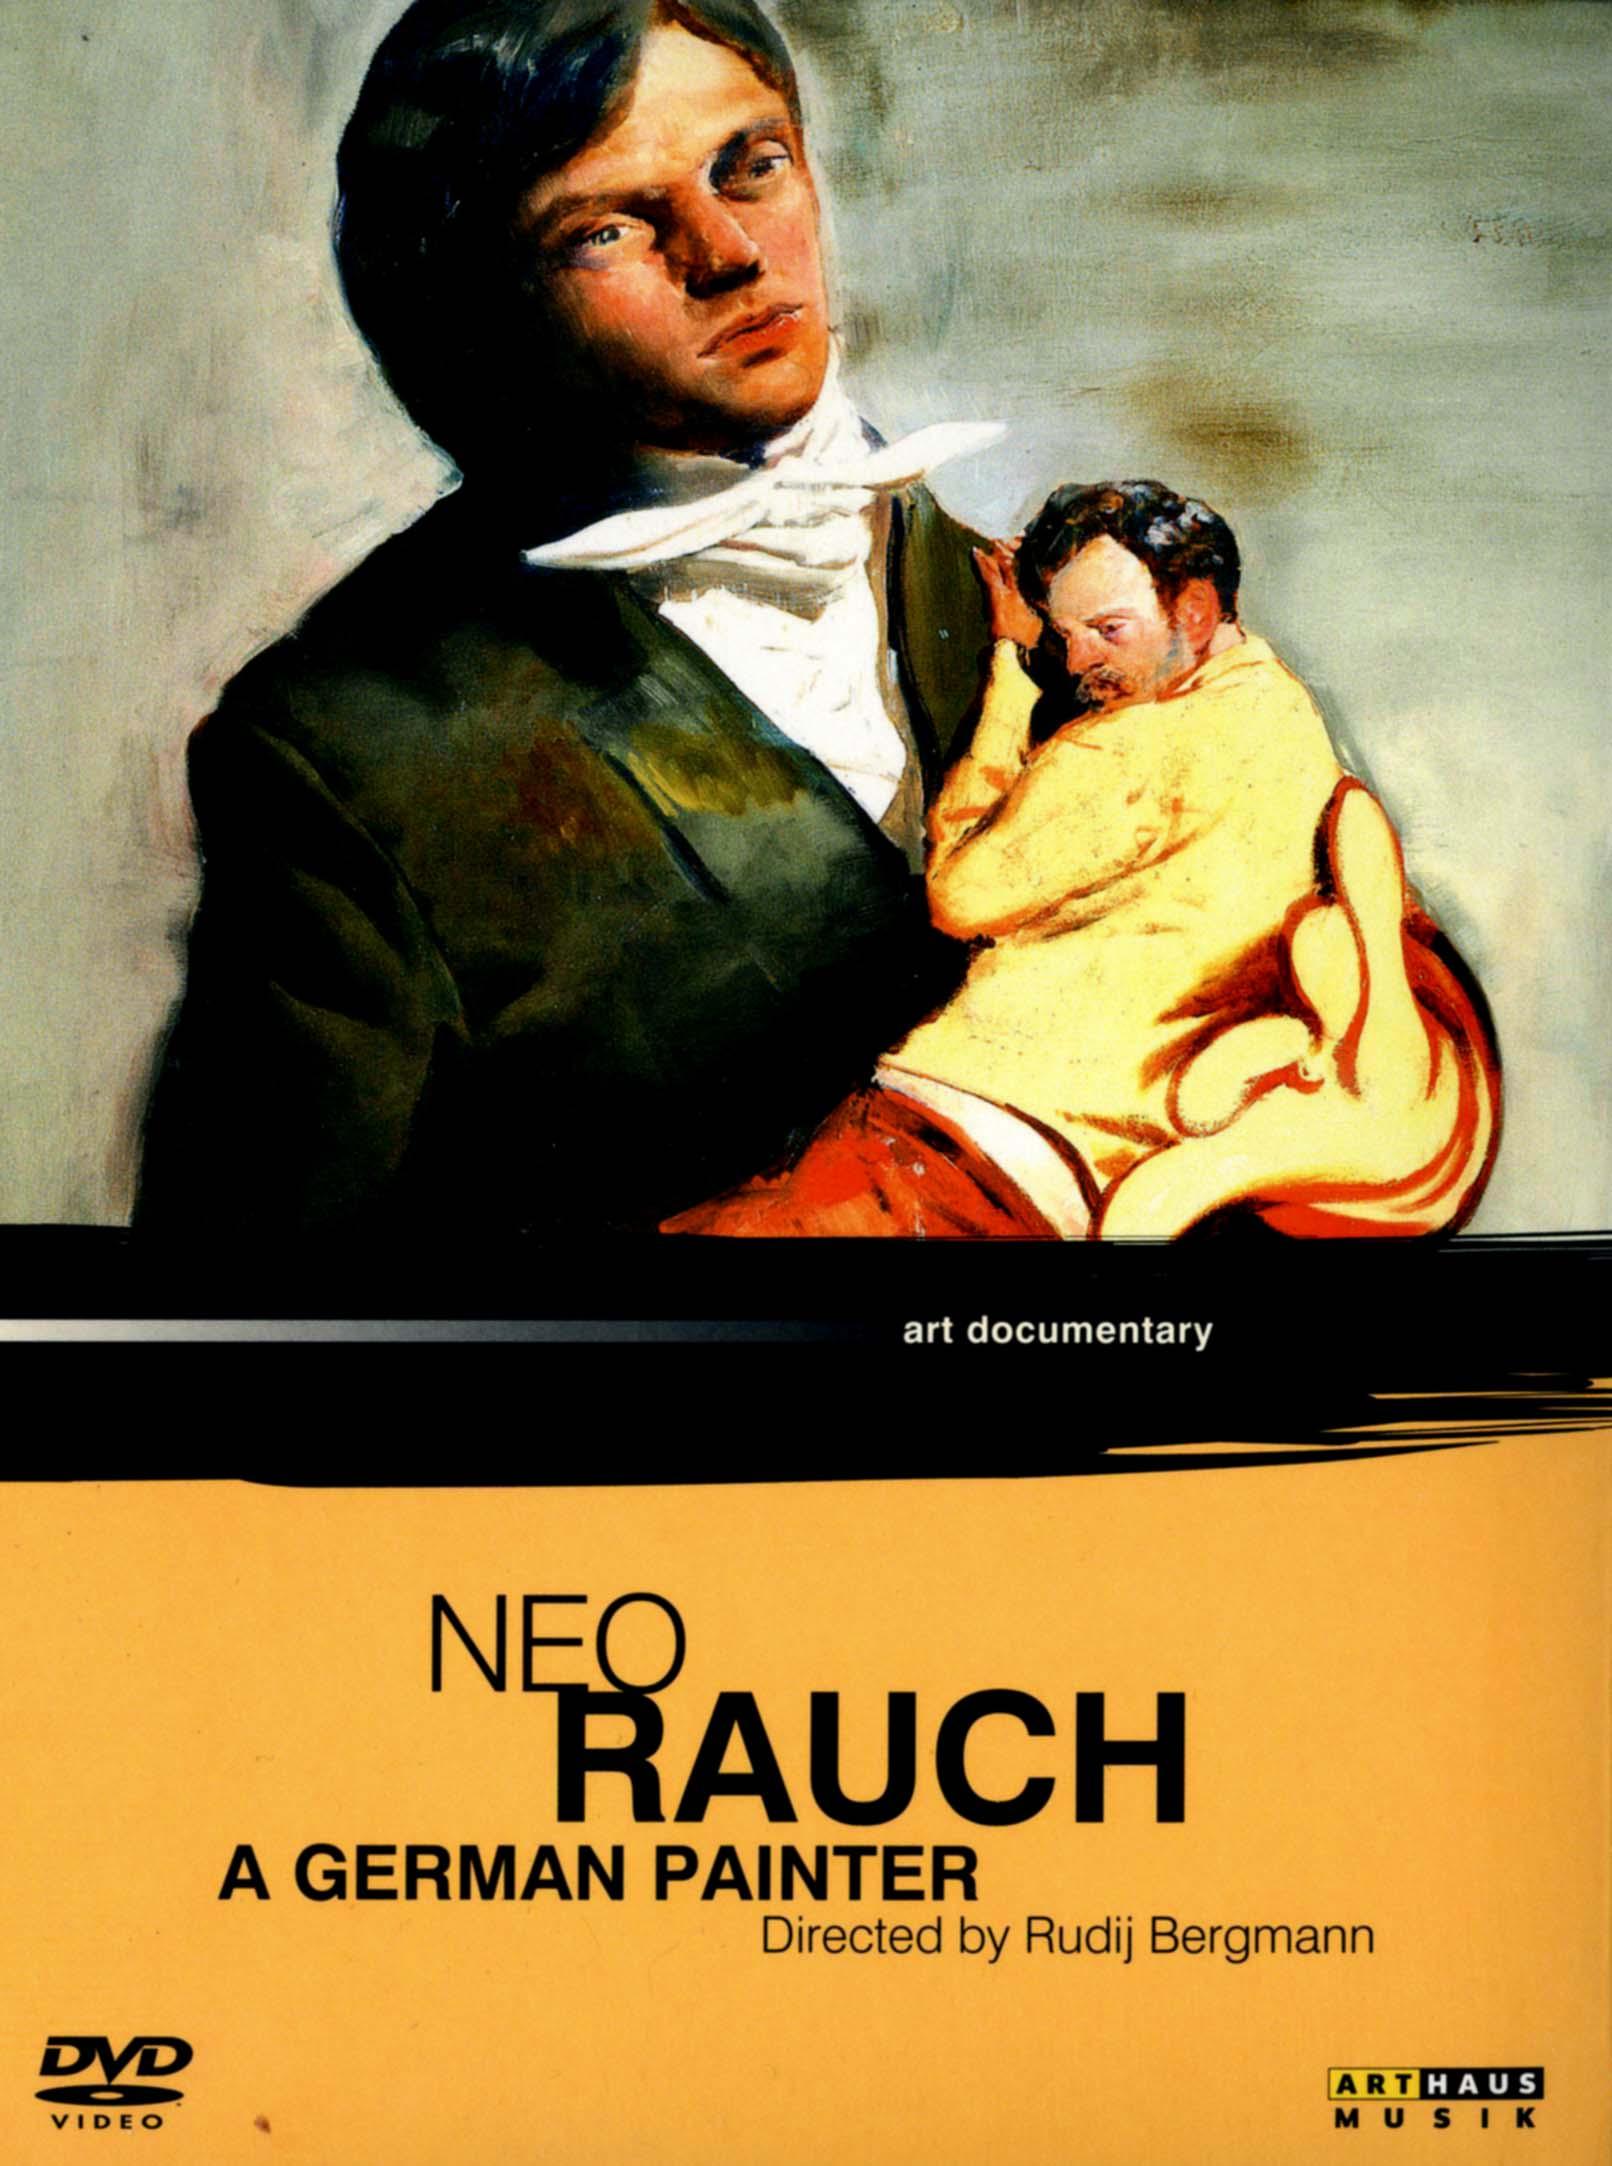 Neo Rauch: A German Painter